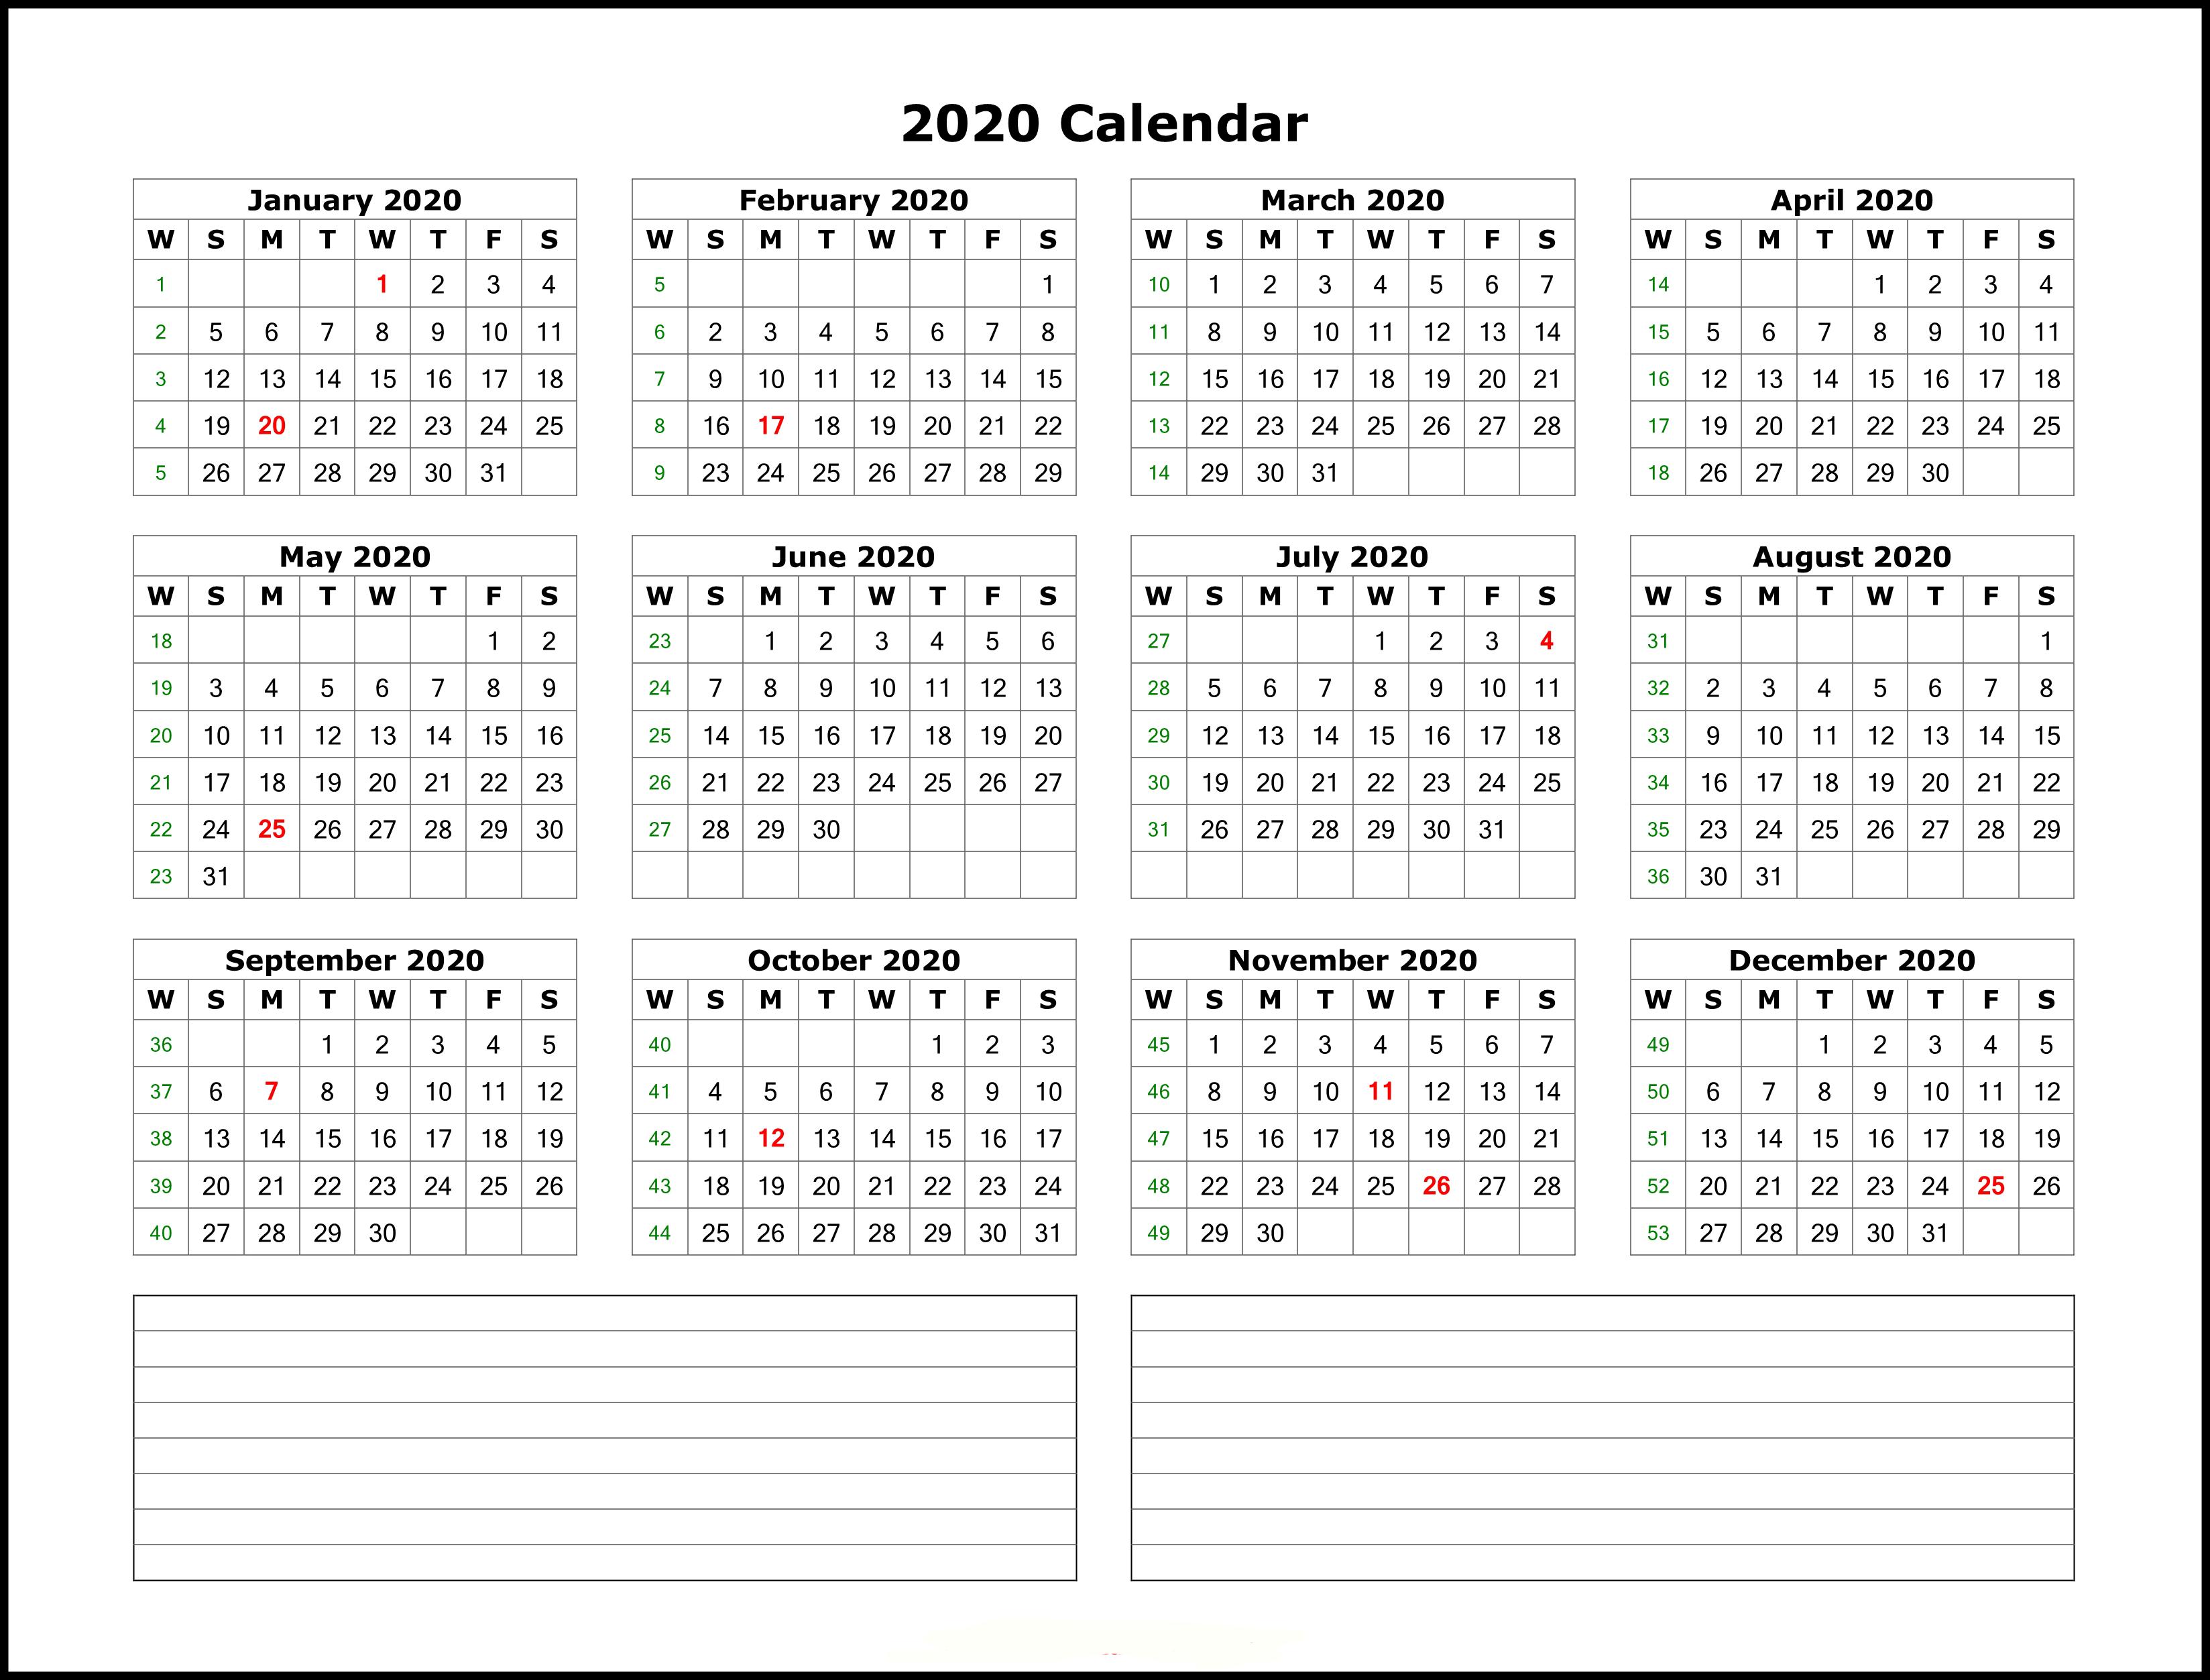 Calendar 2020 Template Excel